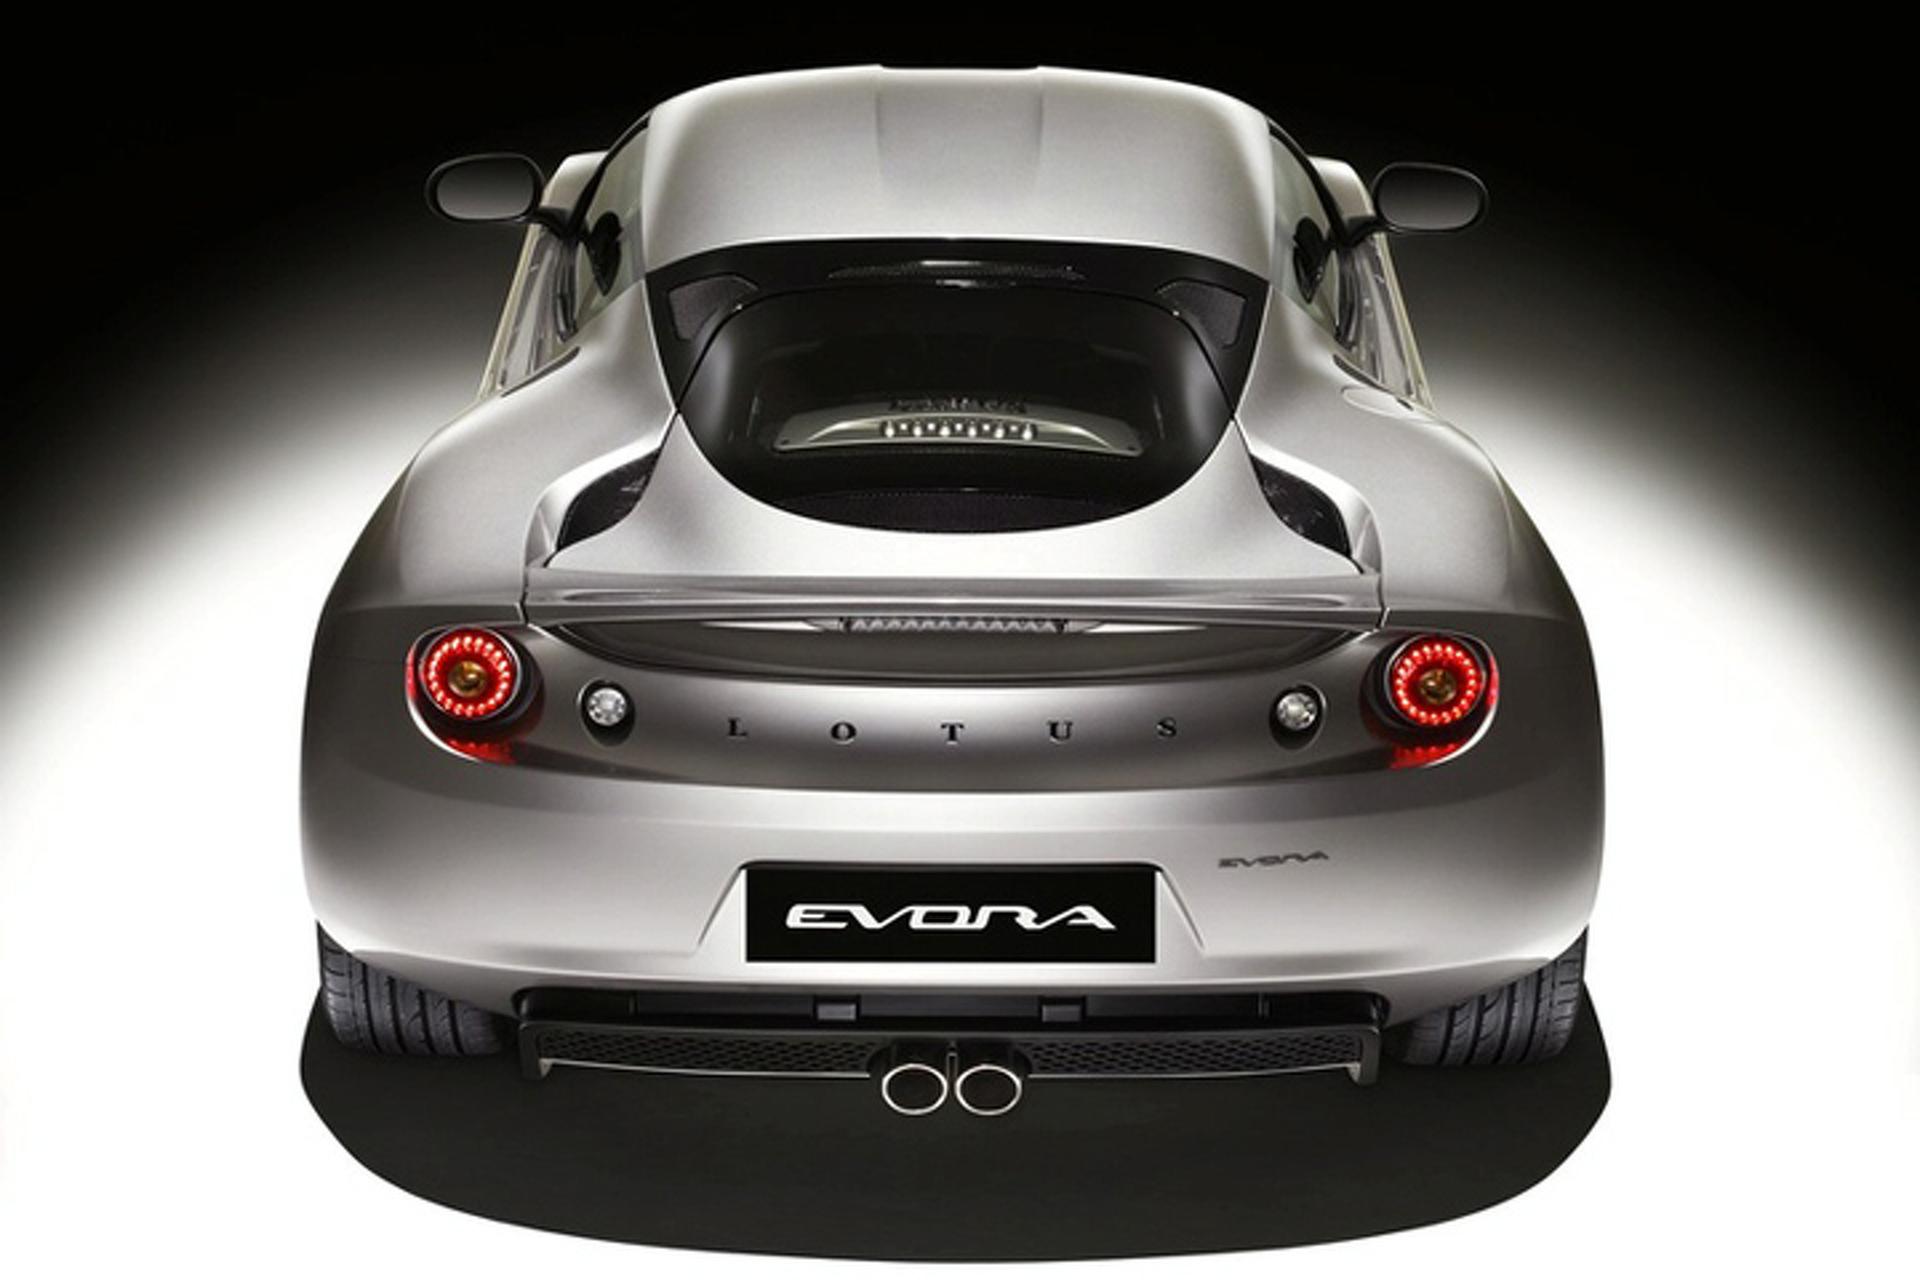 Lotus To Stop Evora sales in the U.S.